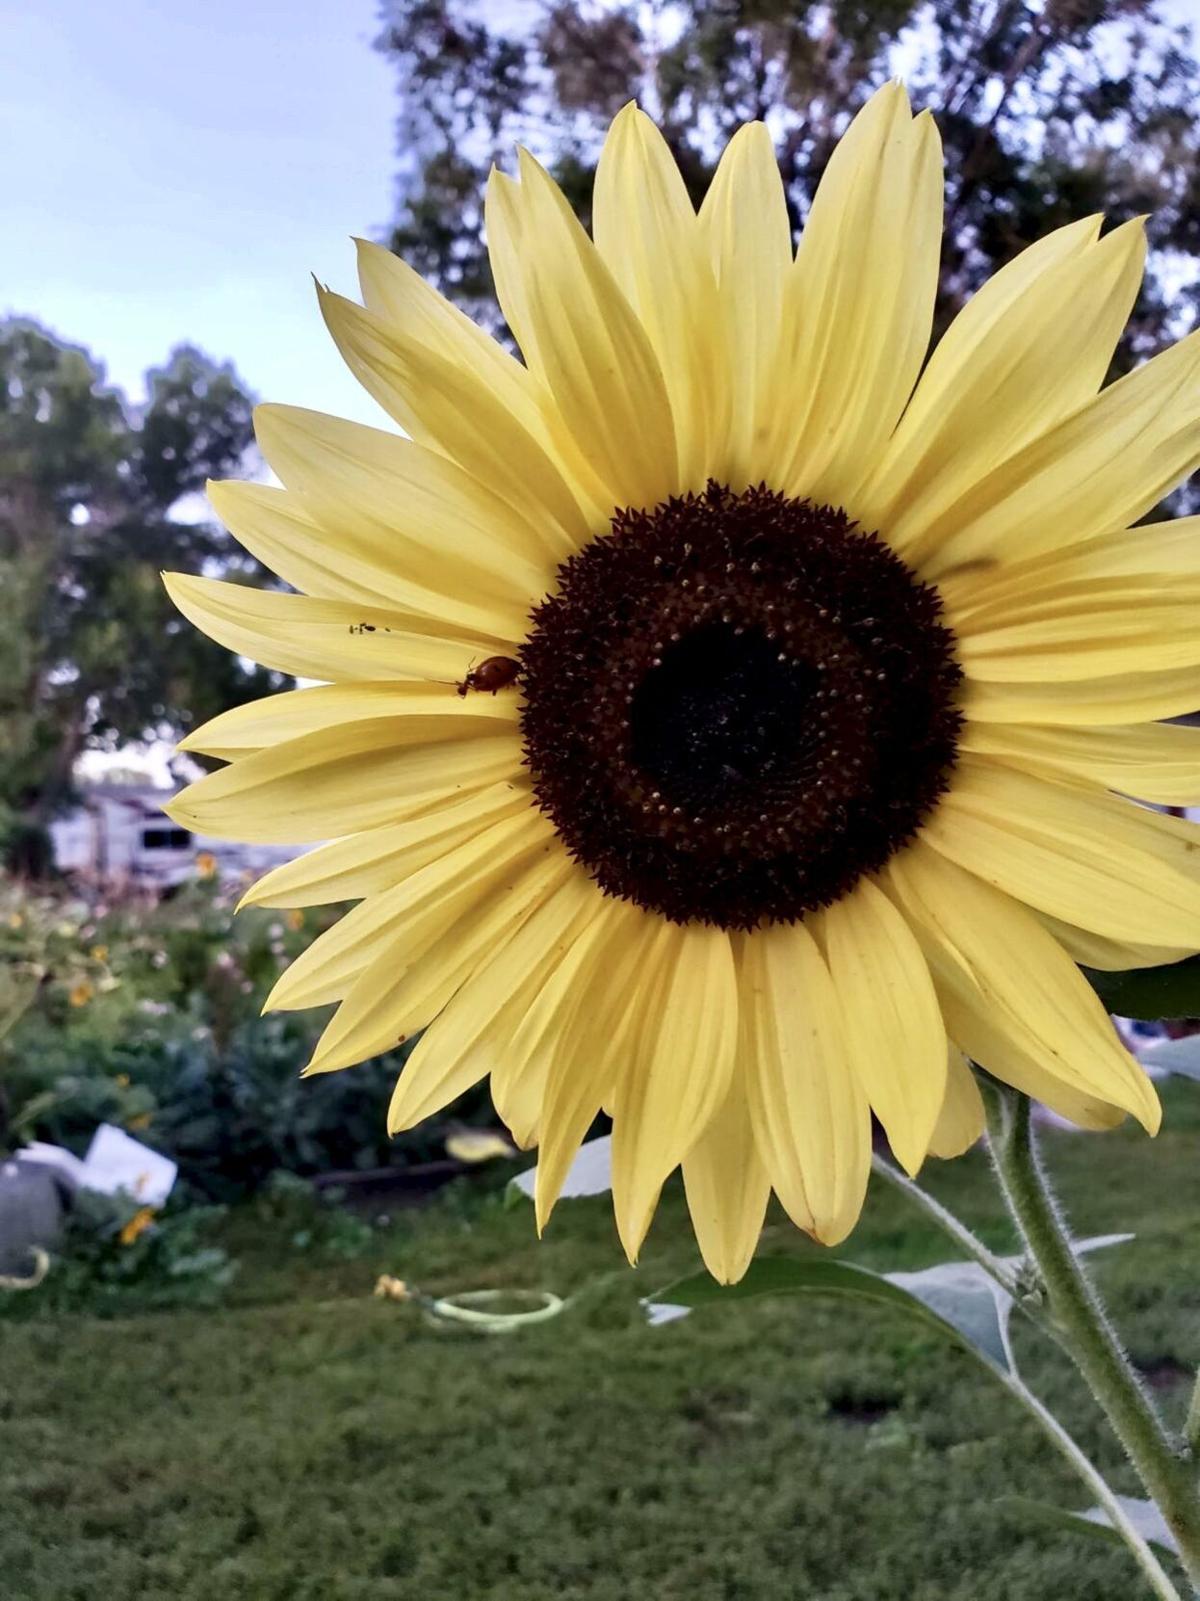 sunflower file photo